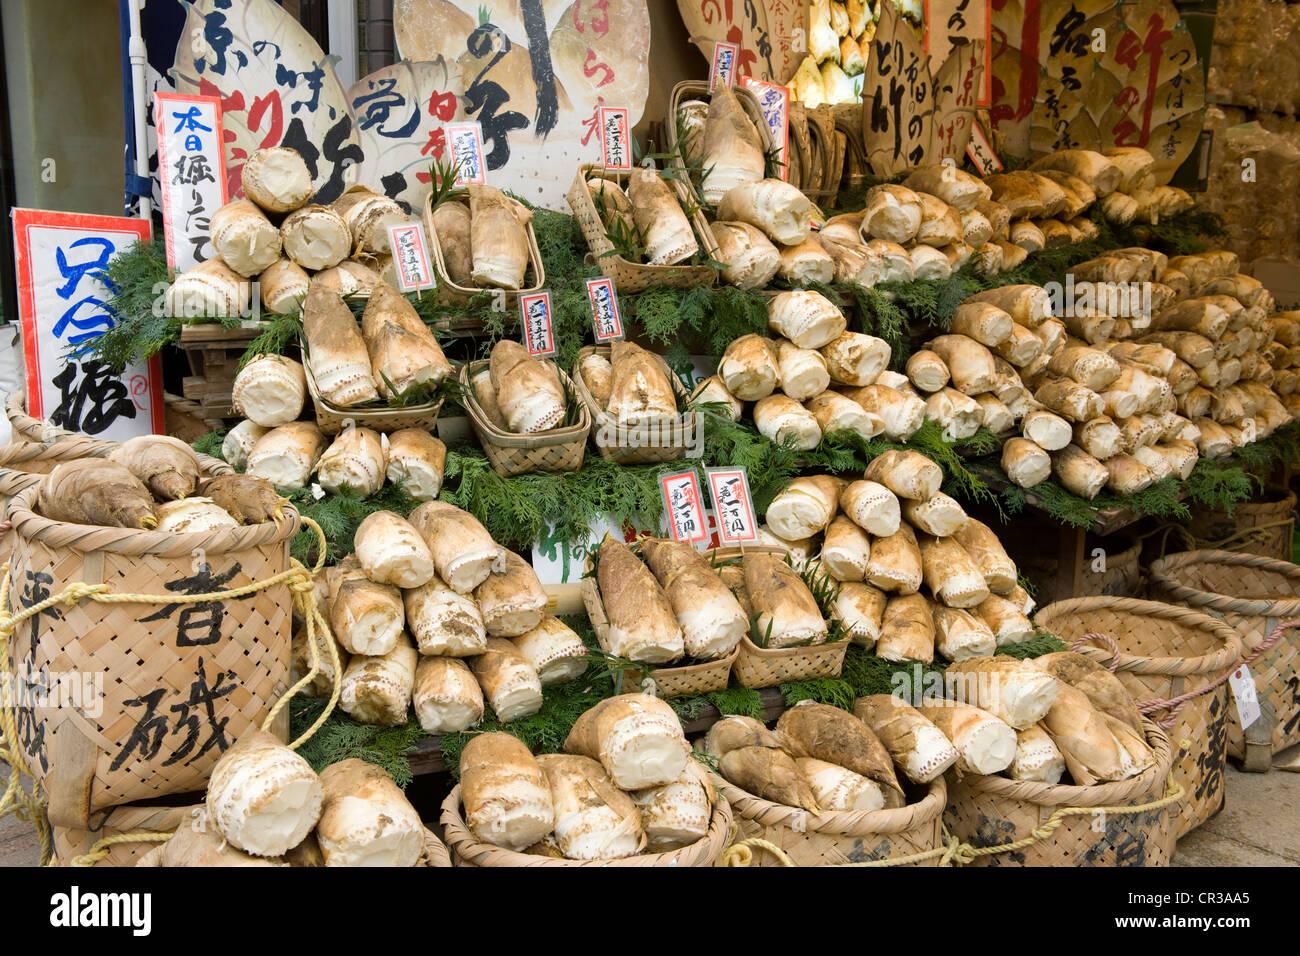 Japan, Honshu Island, Kinki Region, city of Kyoto, bamboo shoot stand Stock Photo